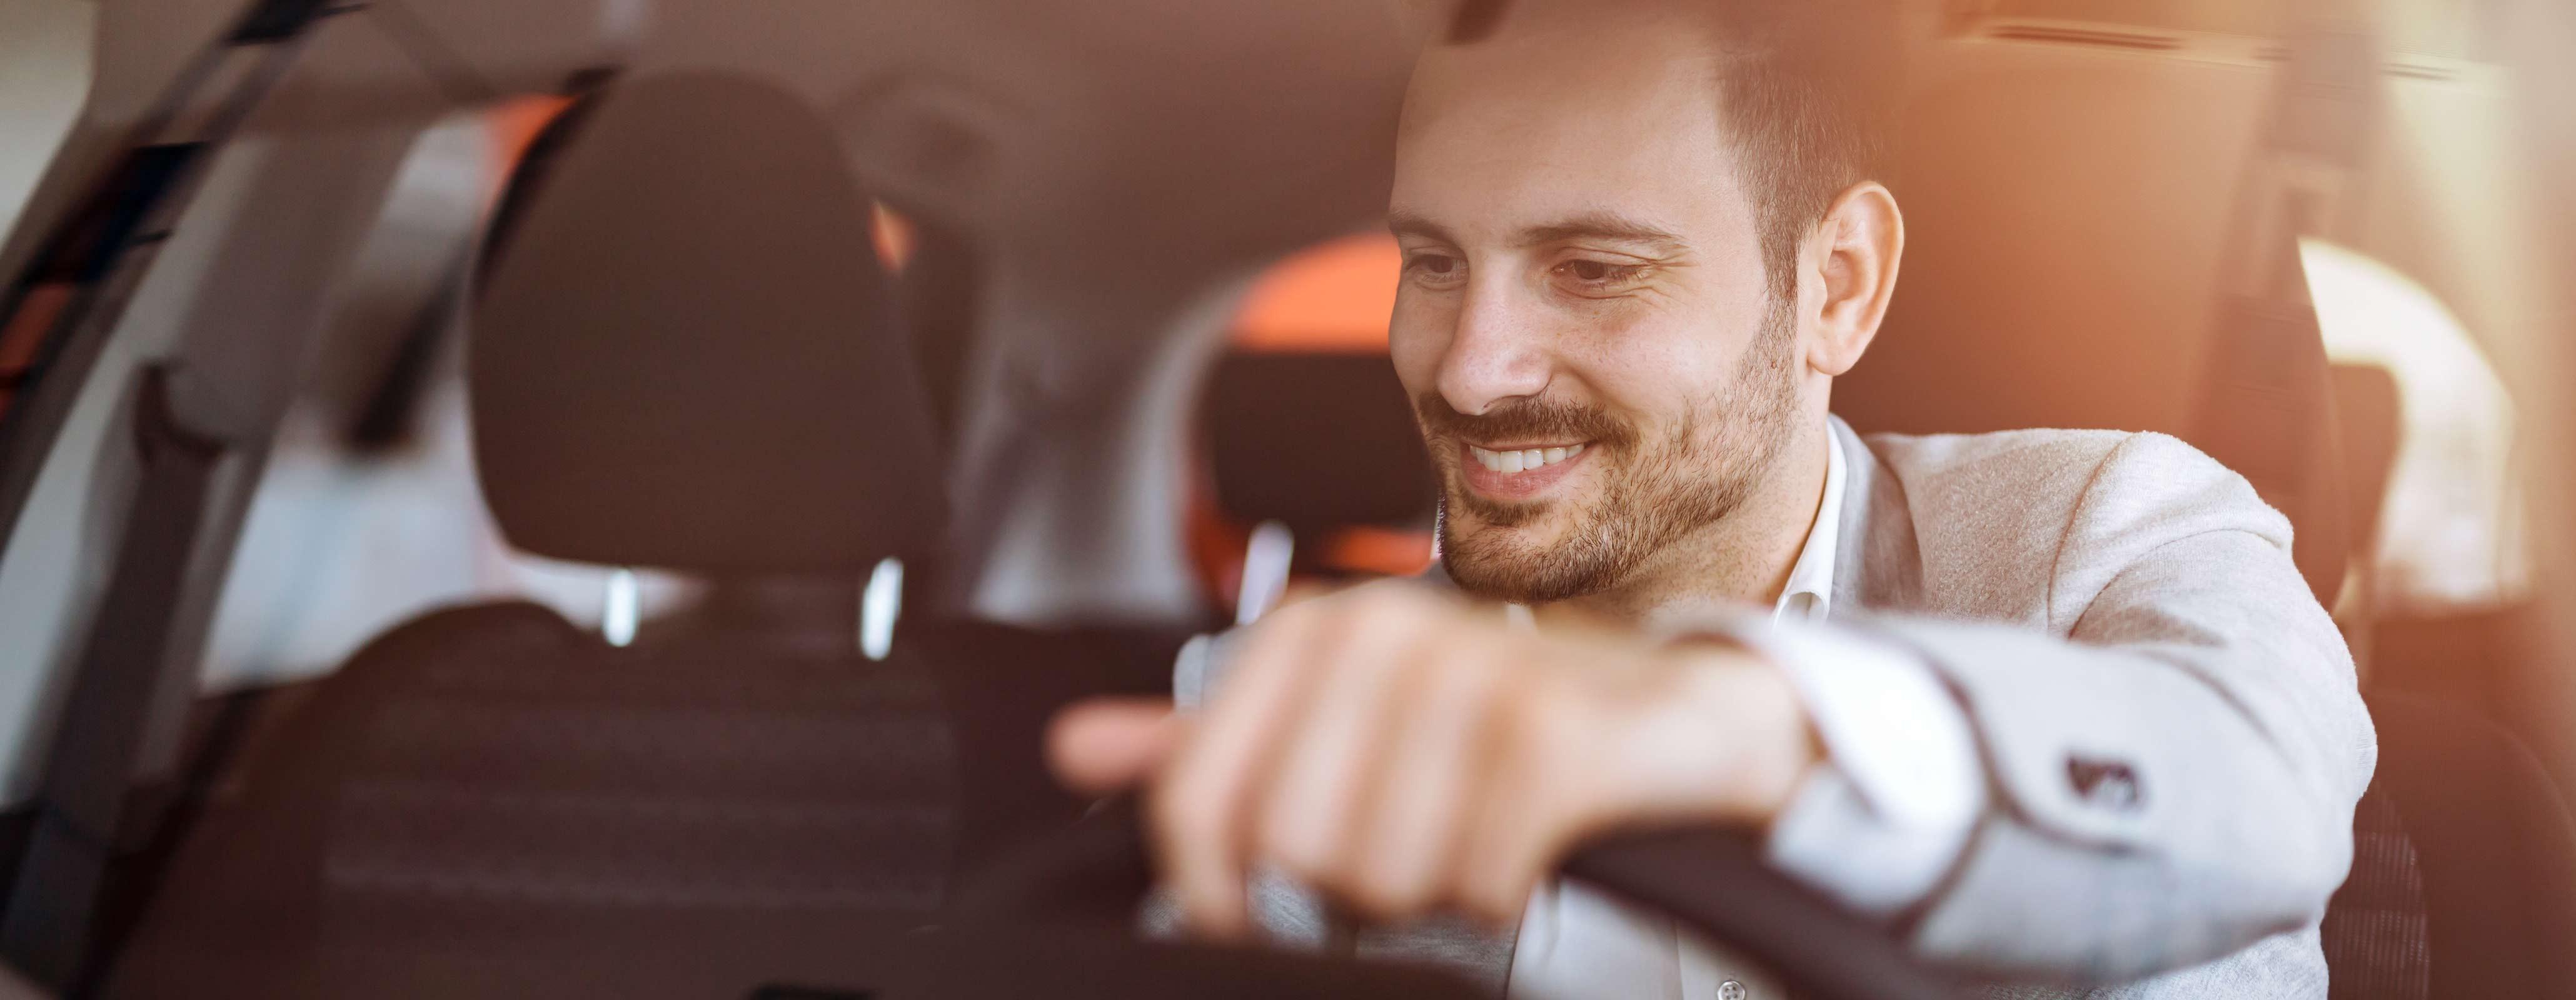 Man in auto